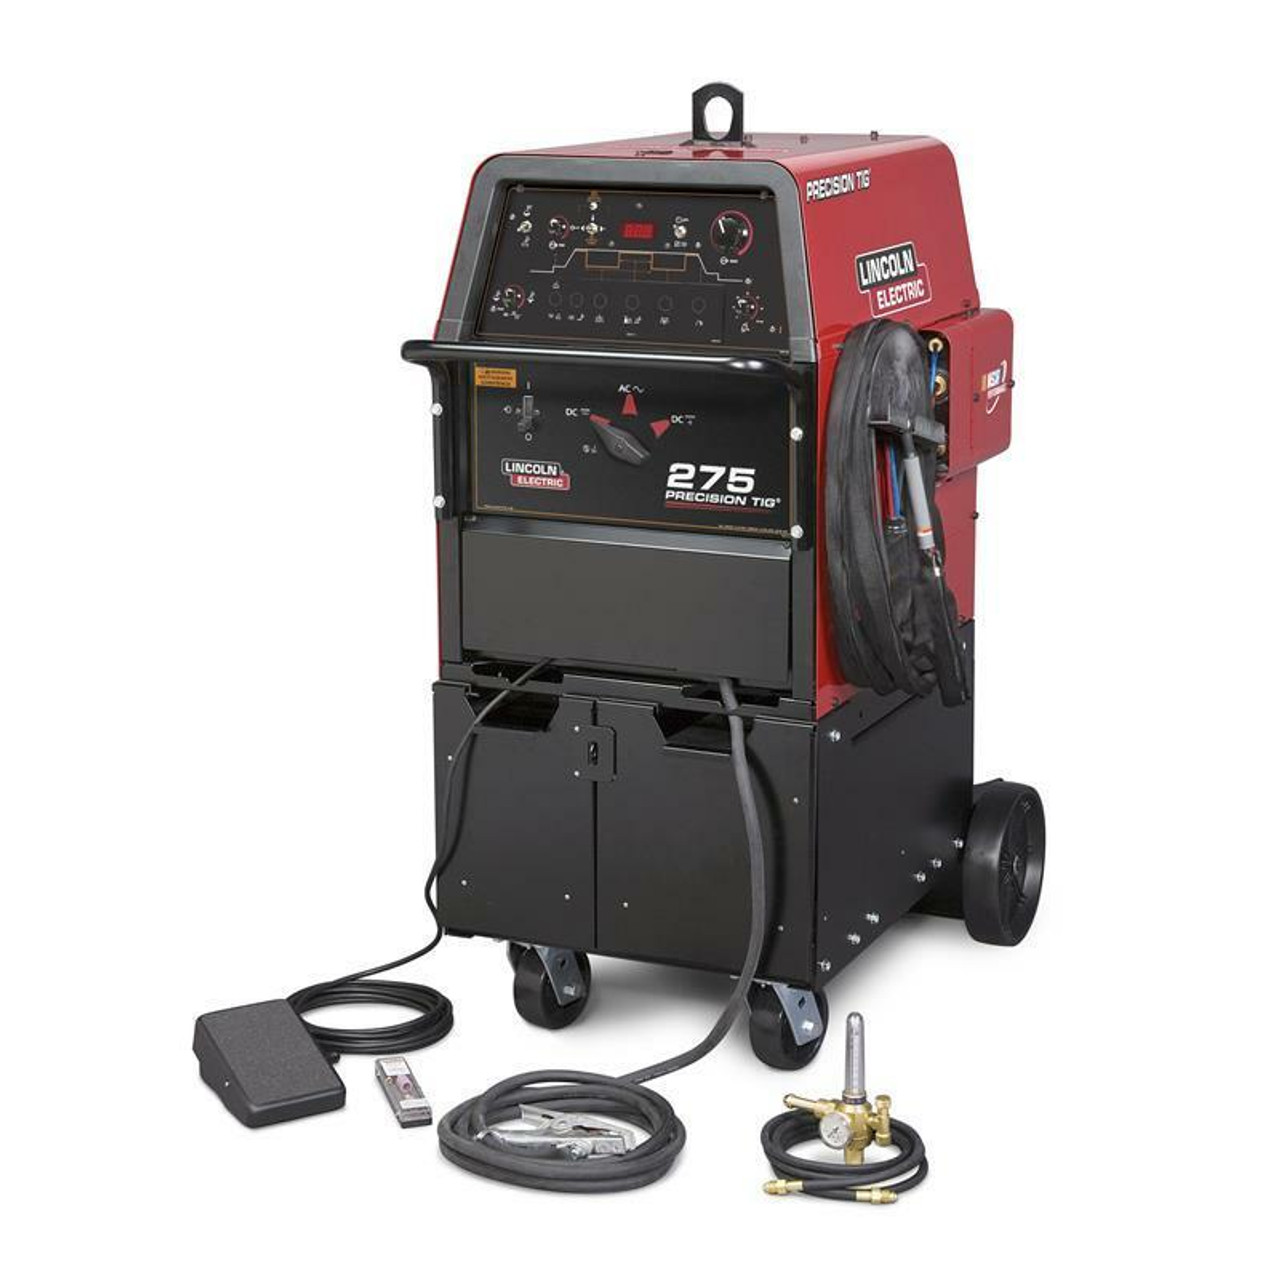 Lincoln Precision TIG 275 TIG Welder Ready Pak K2618-1